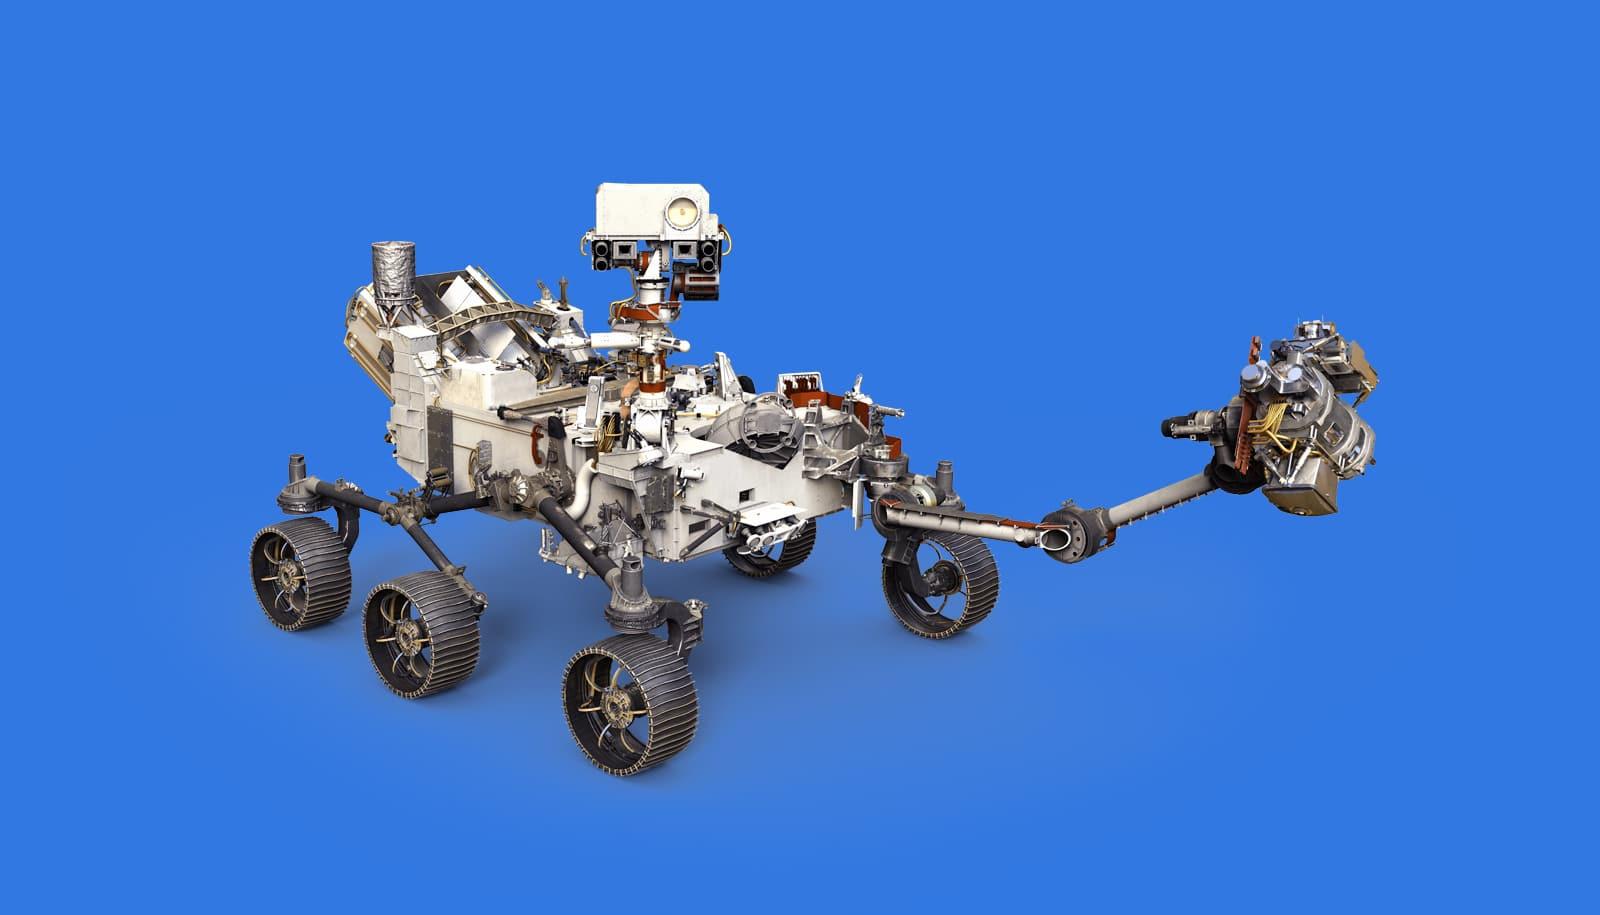 mars 2020 rover landing date - photo #2